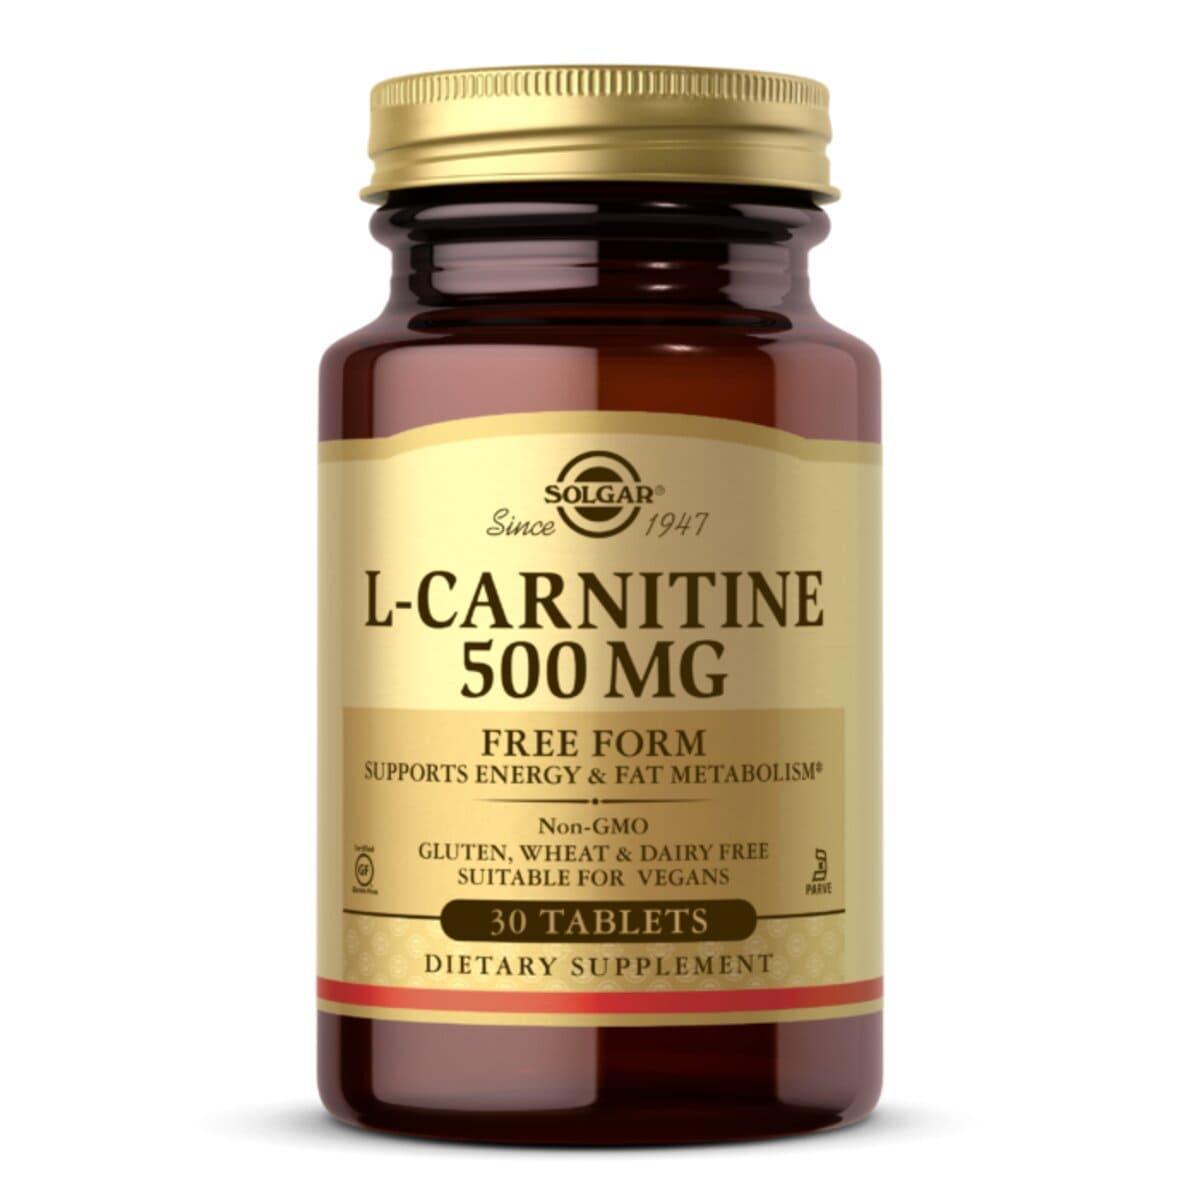 L-Карнитин, 500 мг, L-Carnitine, Solgar, 30 таблеток